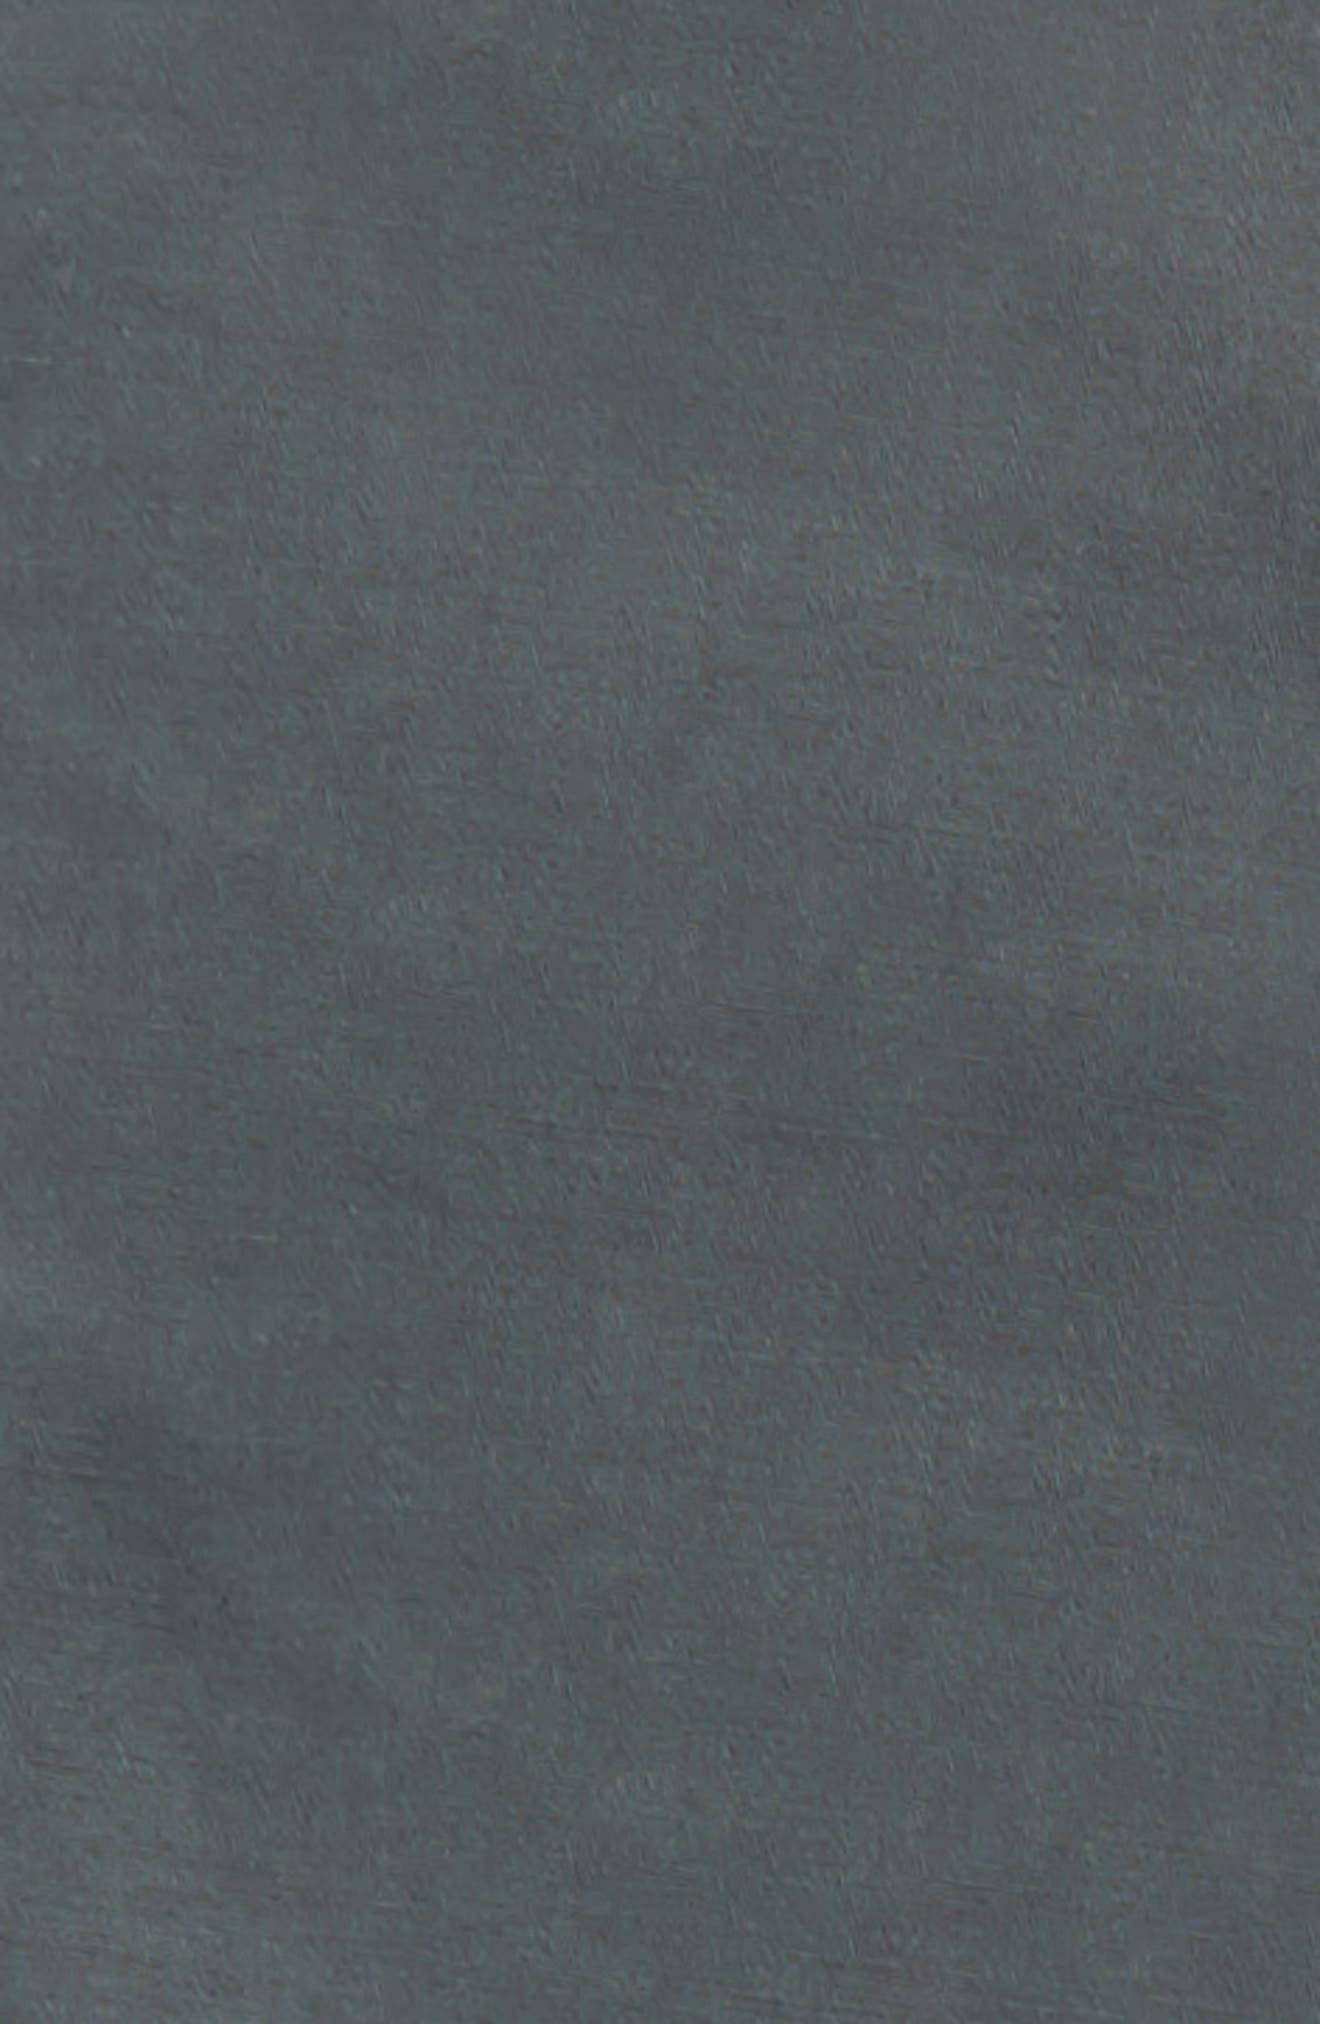 Hudson Jeans Jagger Slim Fit Straight Leg Pants,                             Alternate thumbnail 3, color,                             Unconquered